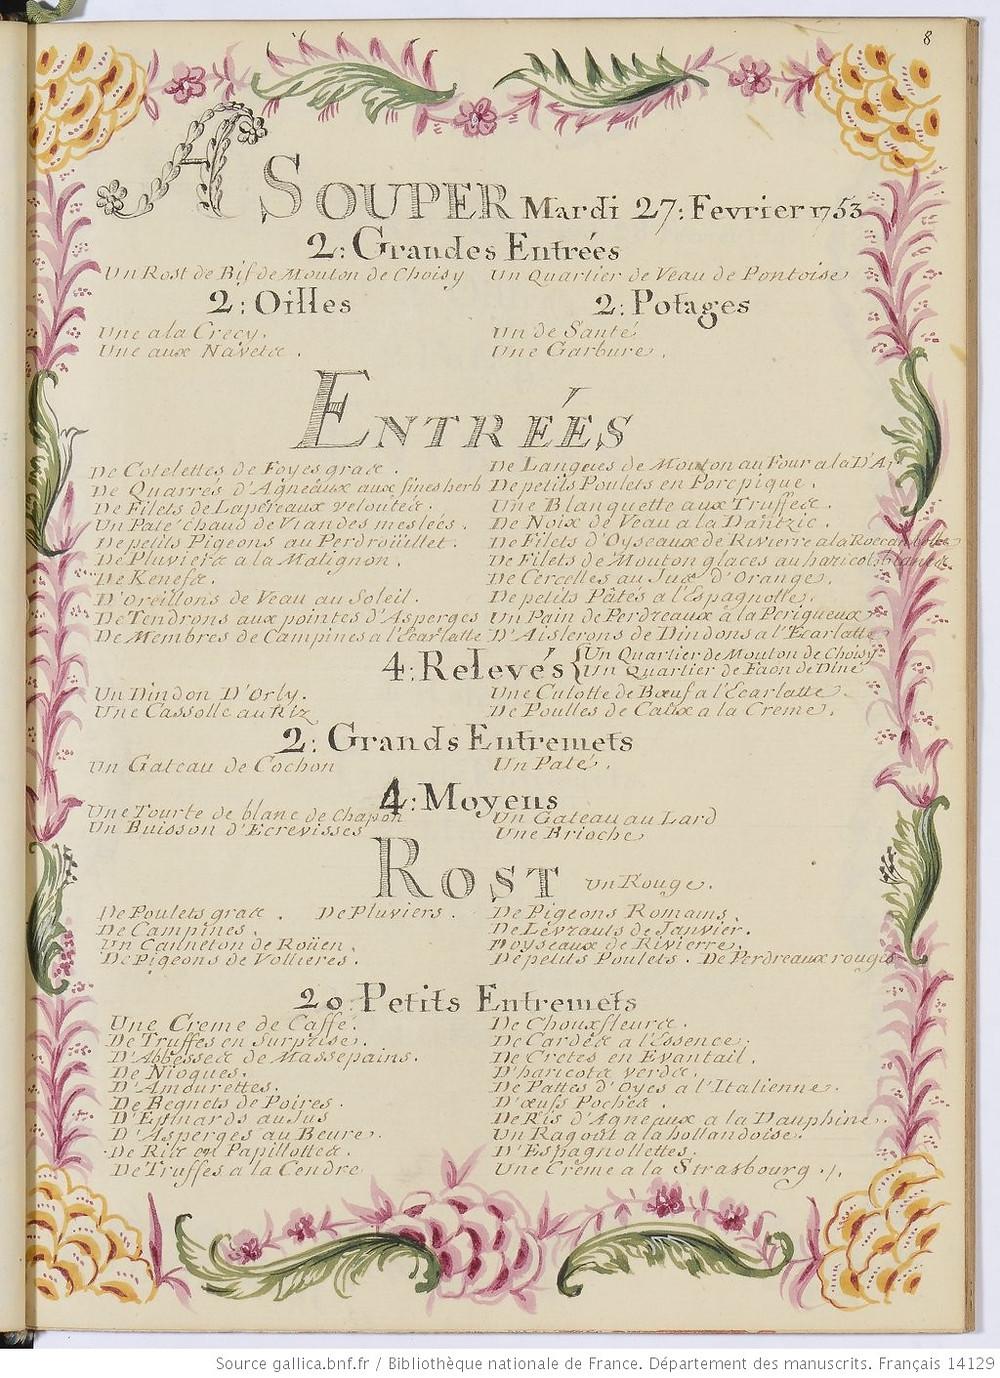 Royal Menu 27 February 1753